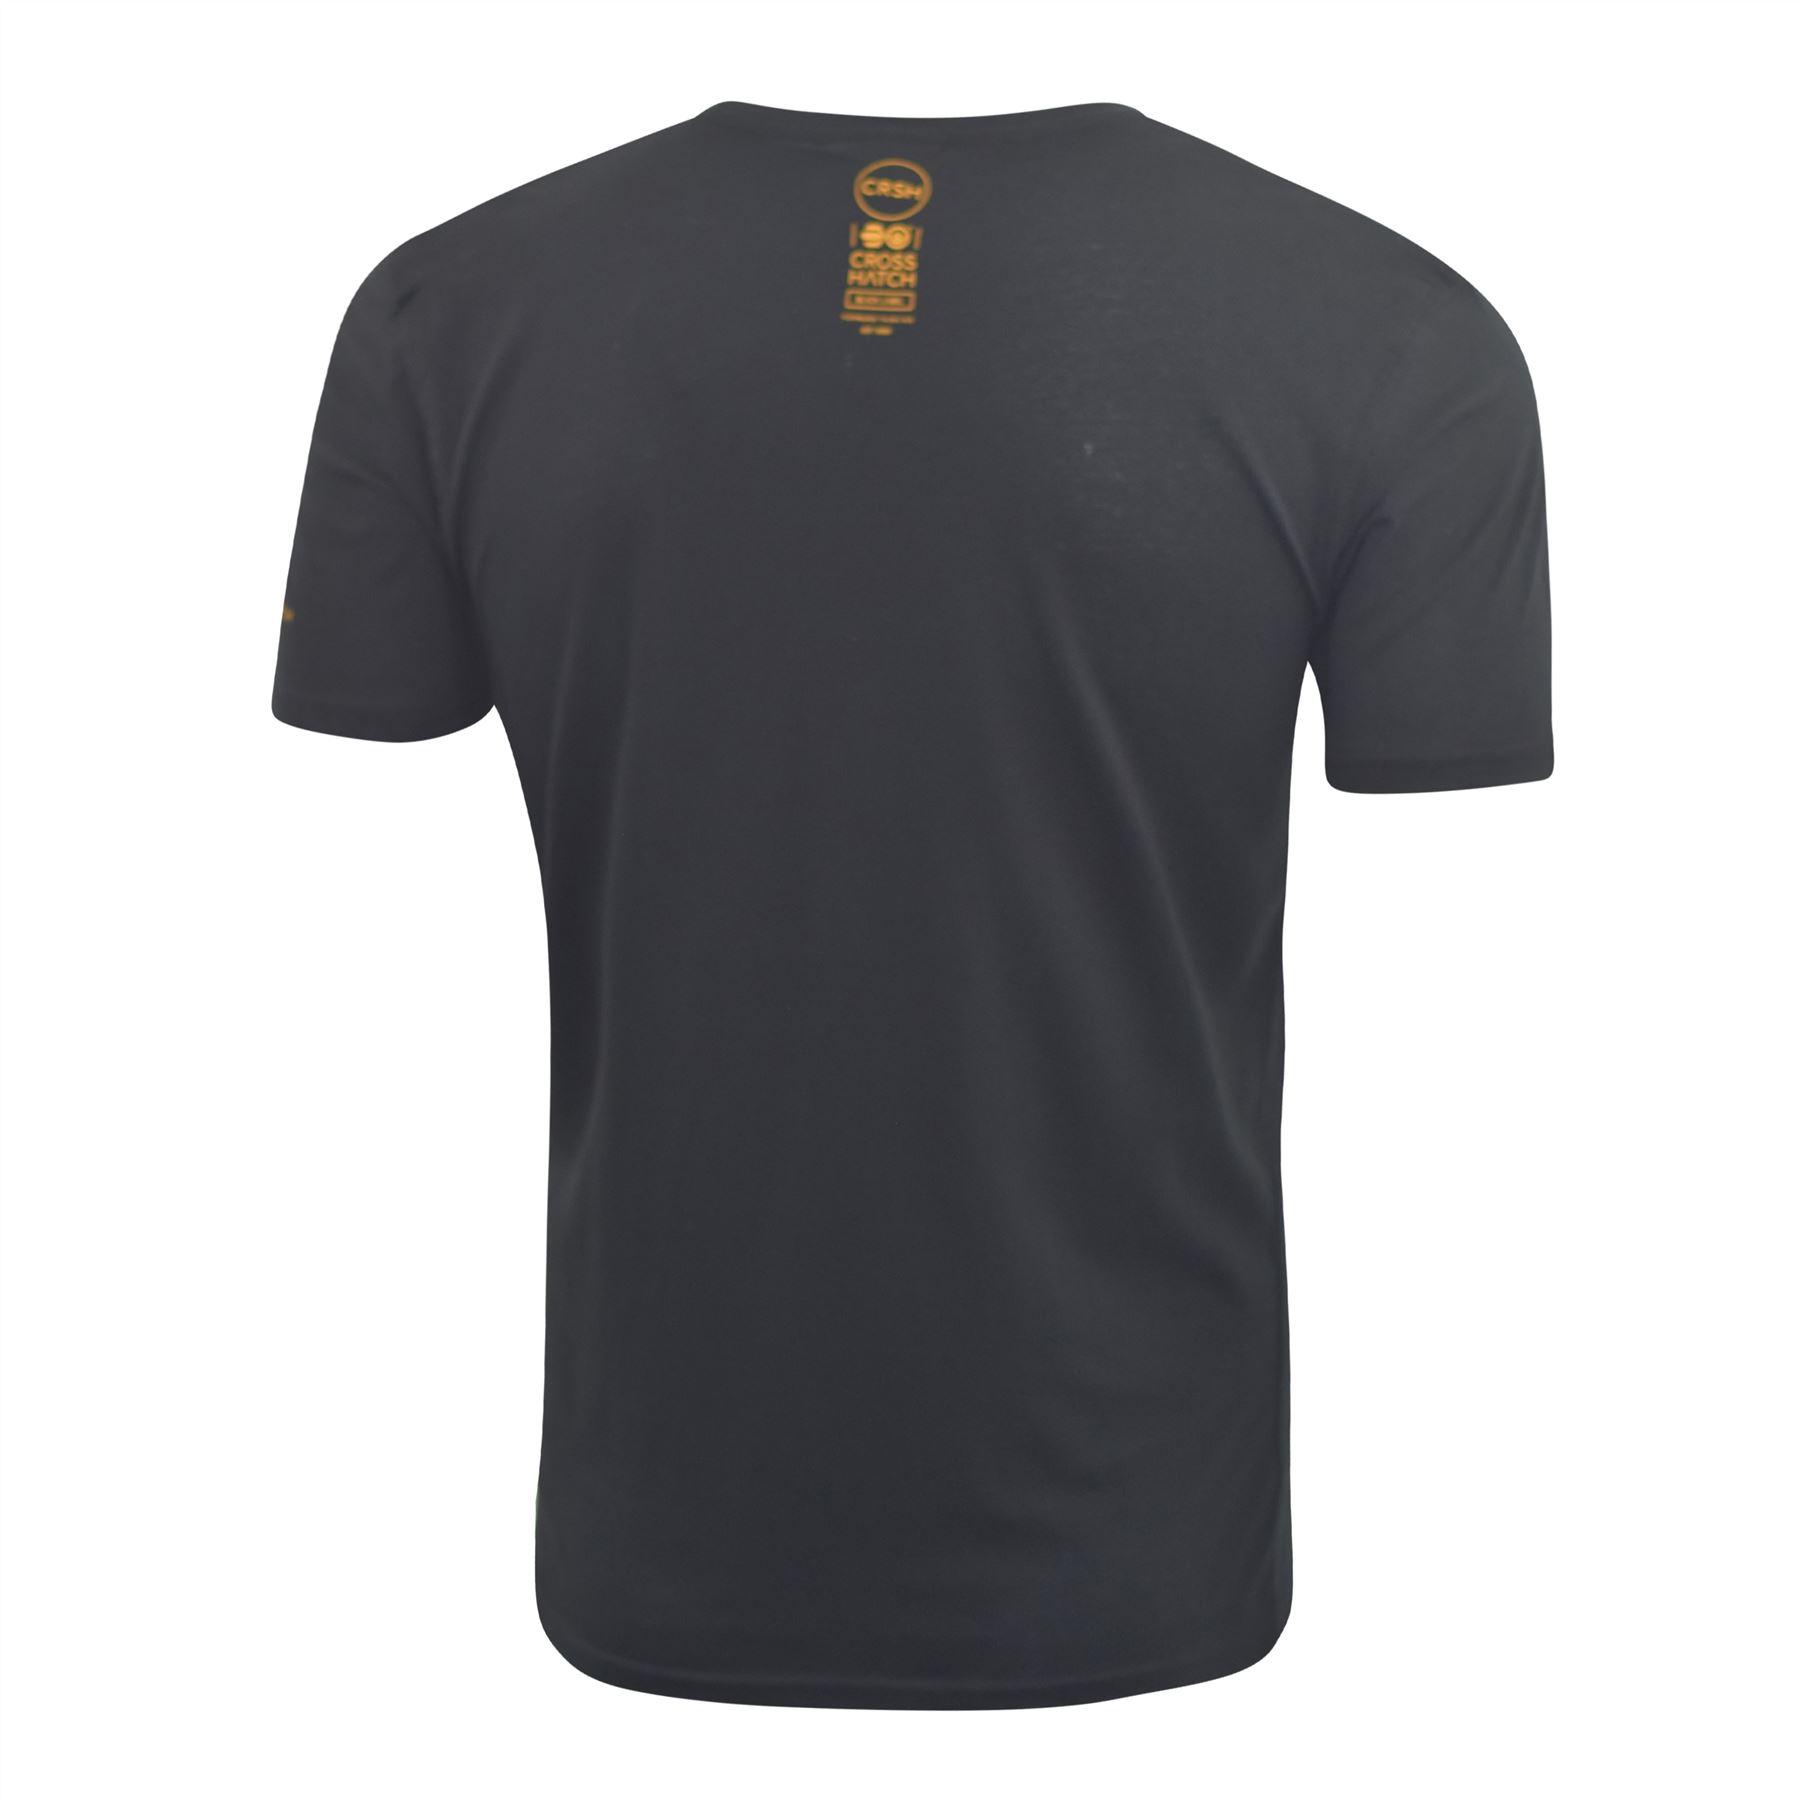 Mens-Crosshatch-T-shirt-Contrast-Graphic-Print-Top-Tee-Westfan thumbnail 4